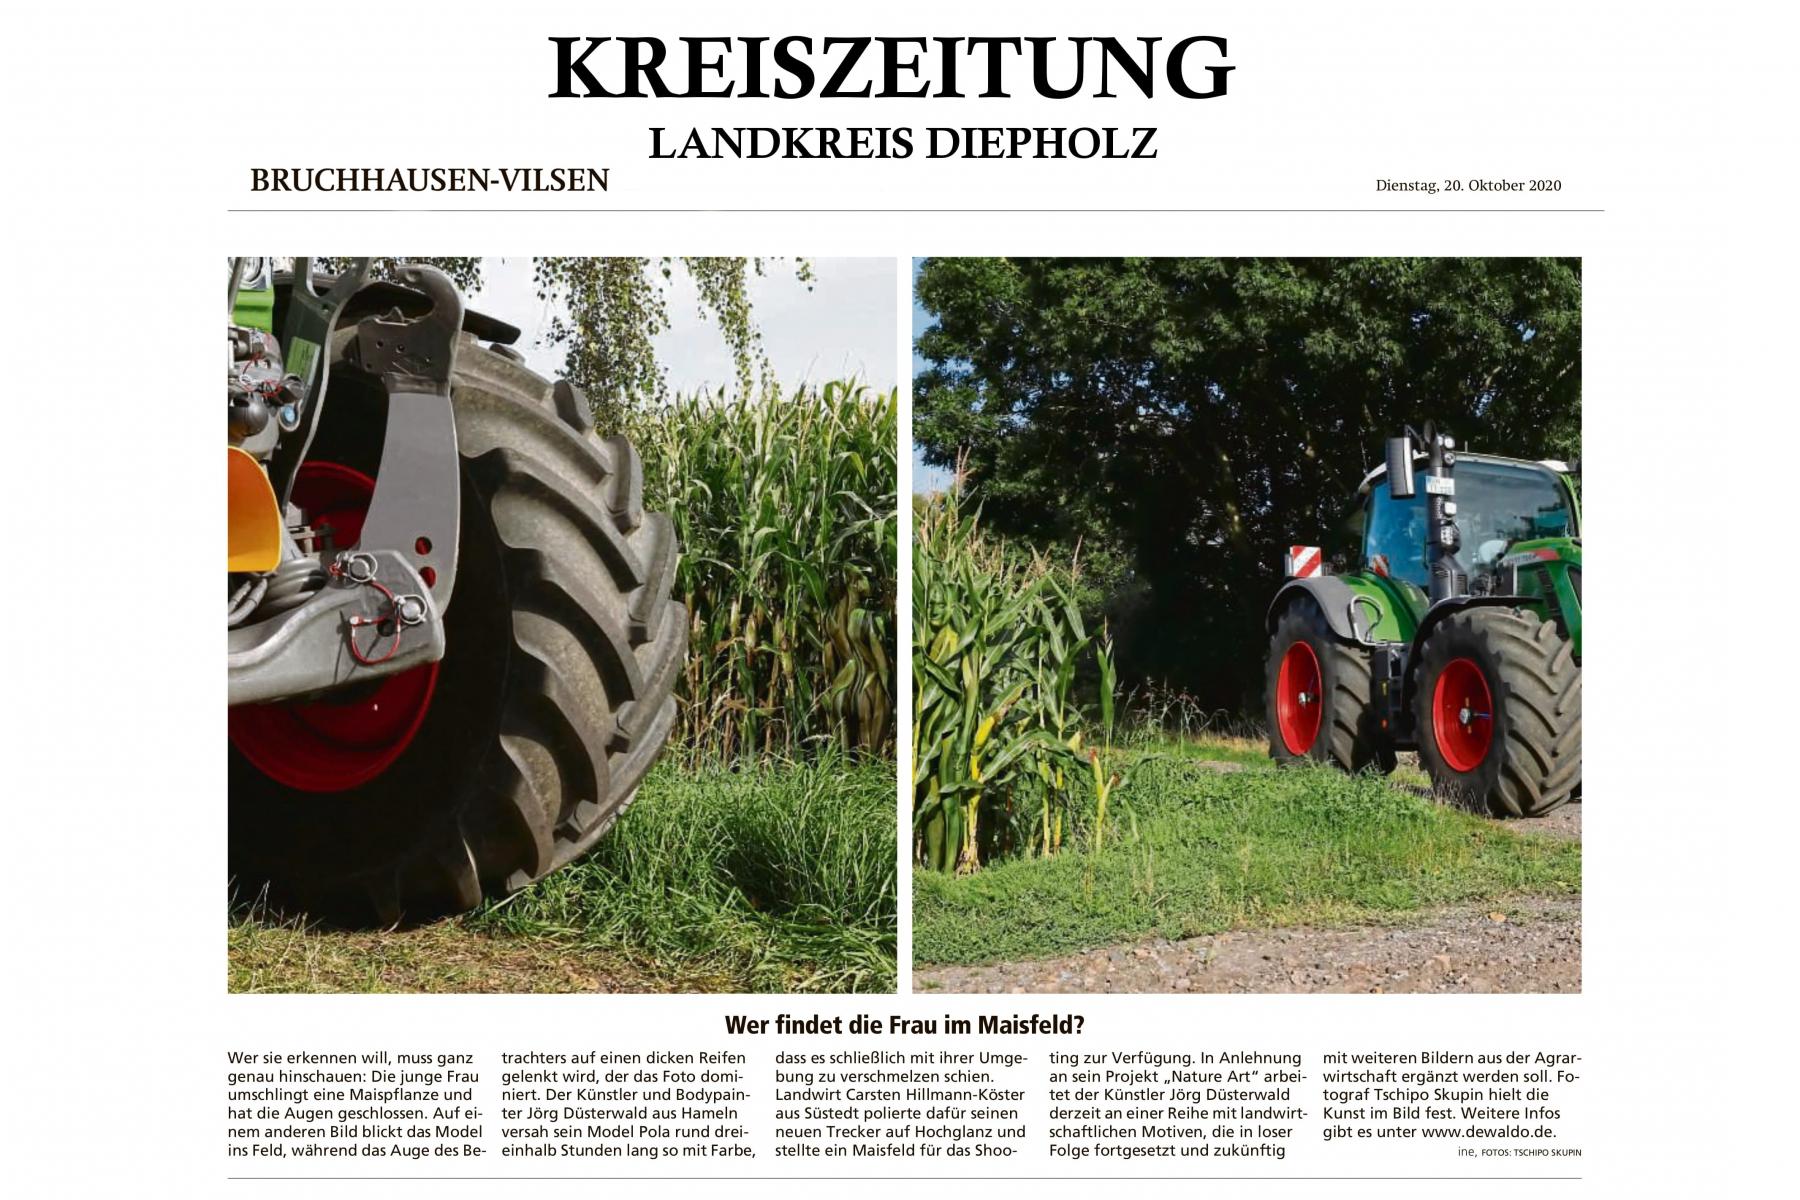 Pressebericht Bodypaintingprojekt AGRAR ART des Künstlers Jörg Düsterwald (Medium: Kreiszeitung Diepholz / Okt.2010)